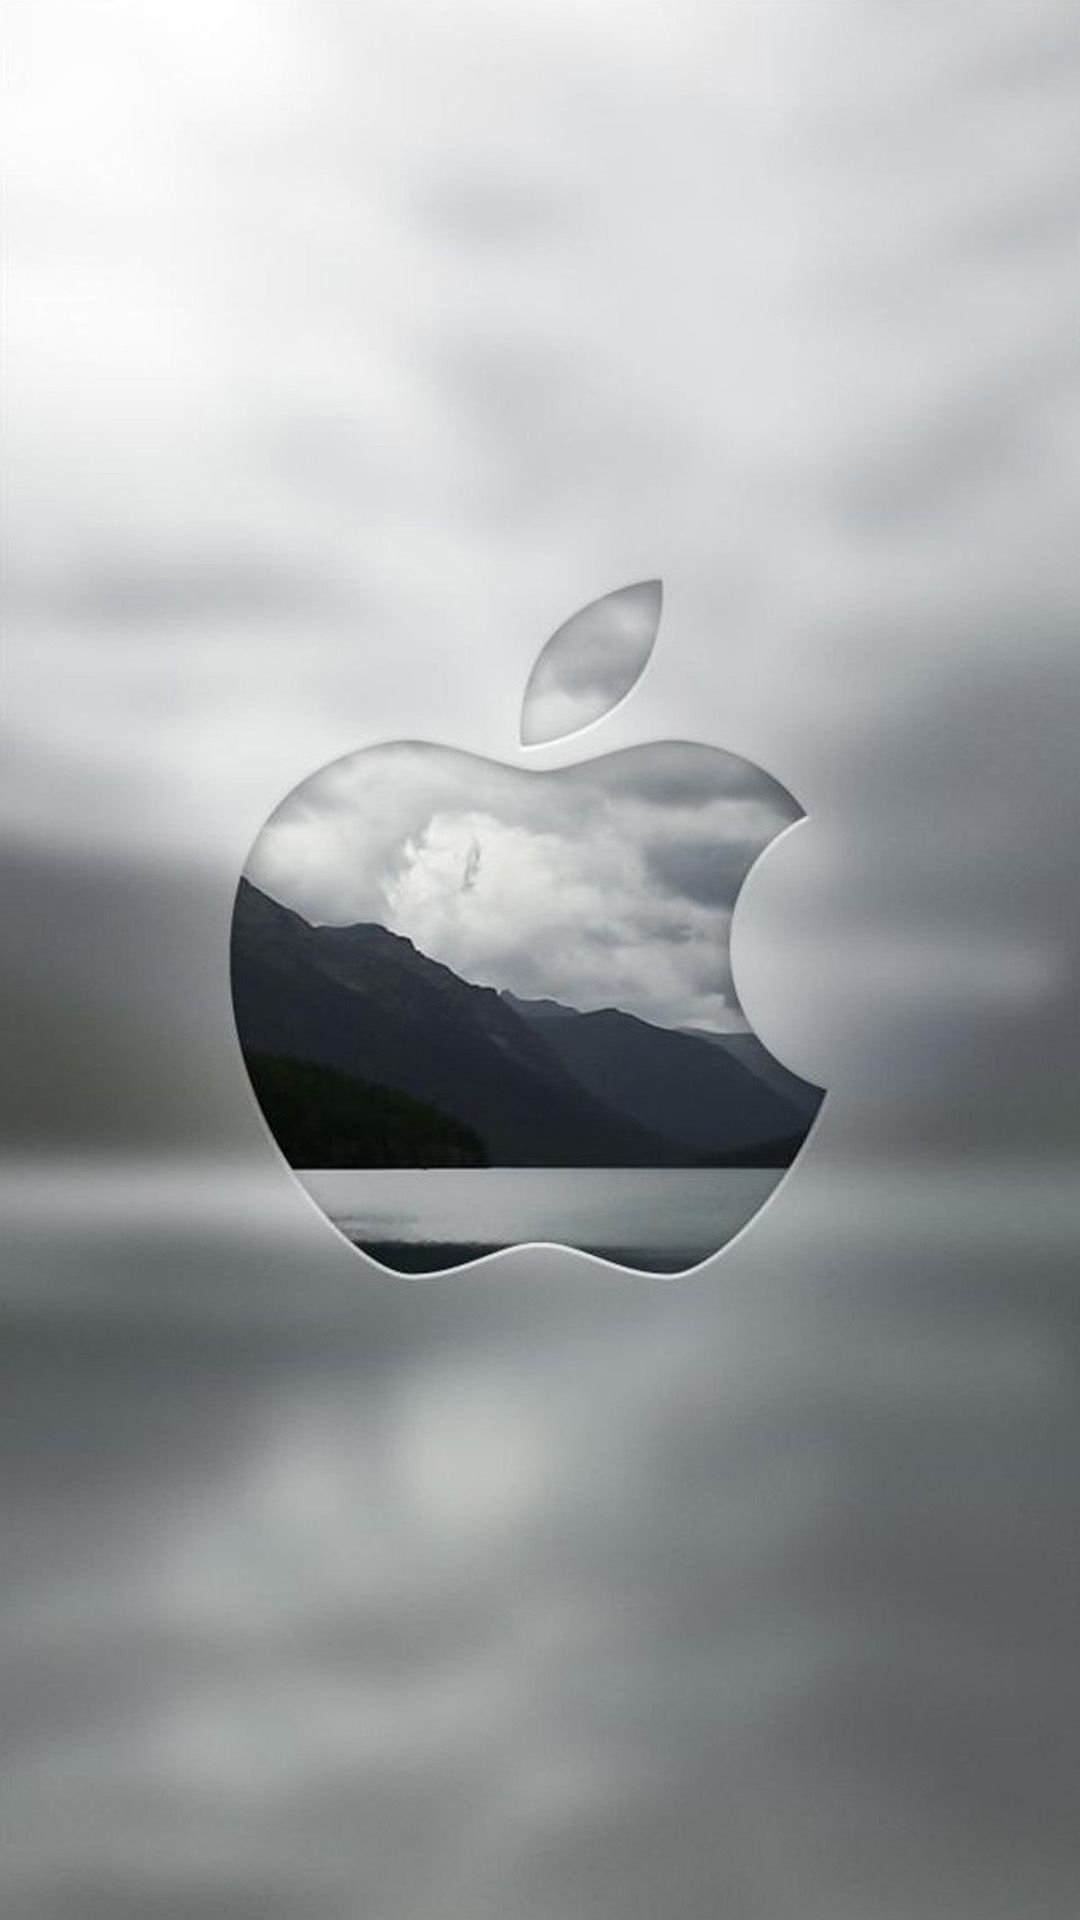 monotone apple | iphone wallpapers | pinterest | iphone wallpaper